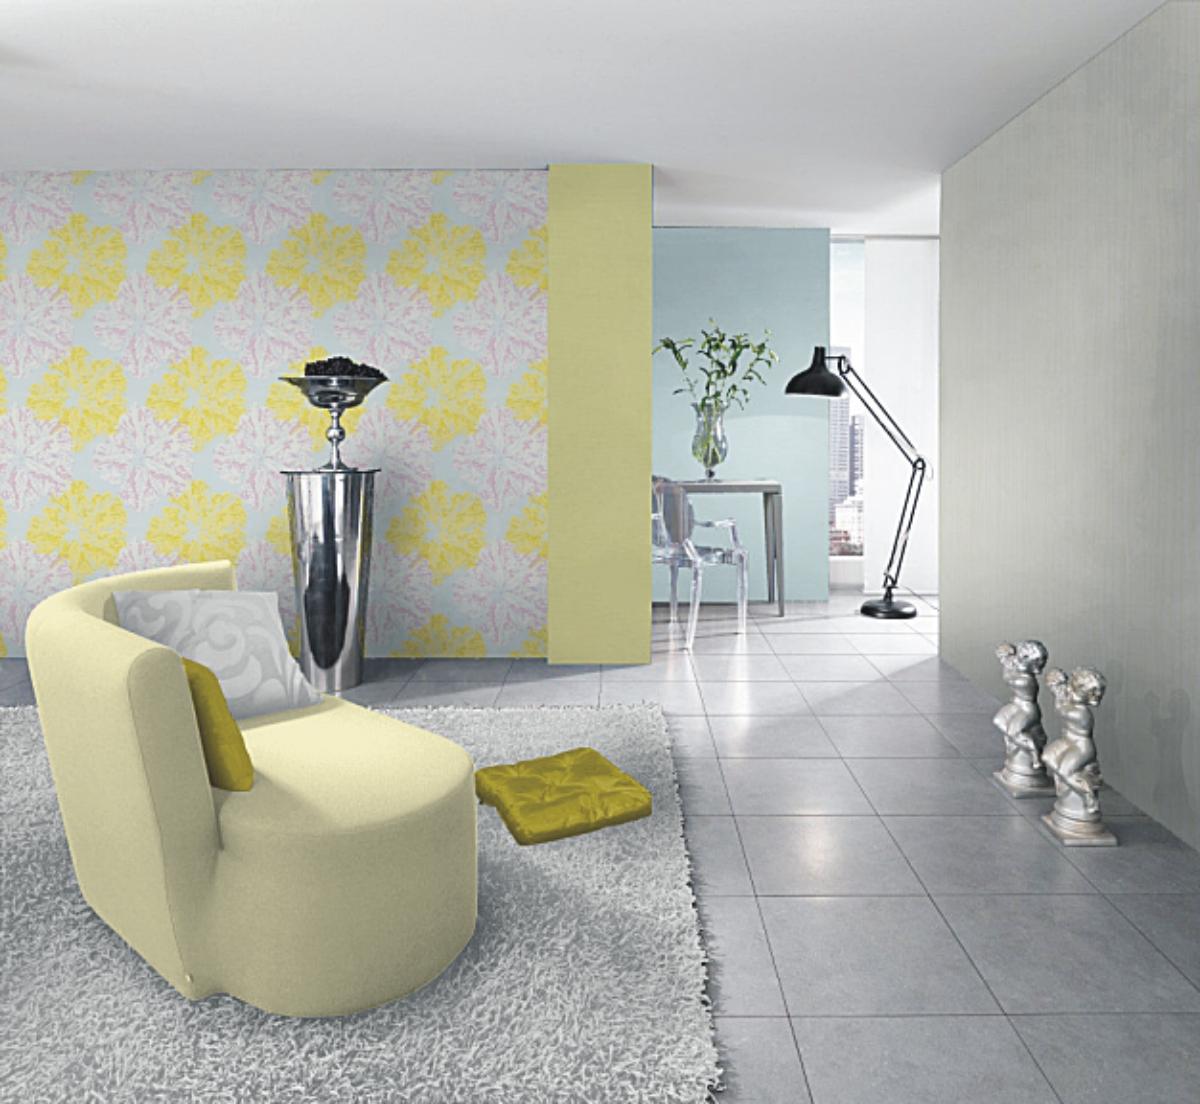 rasch tapete barbara becker 2013 780130 neu modern art ebay. Black Bedroom Furniture Sets. Home Design Ideas